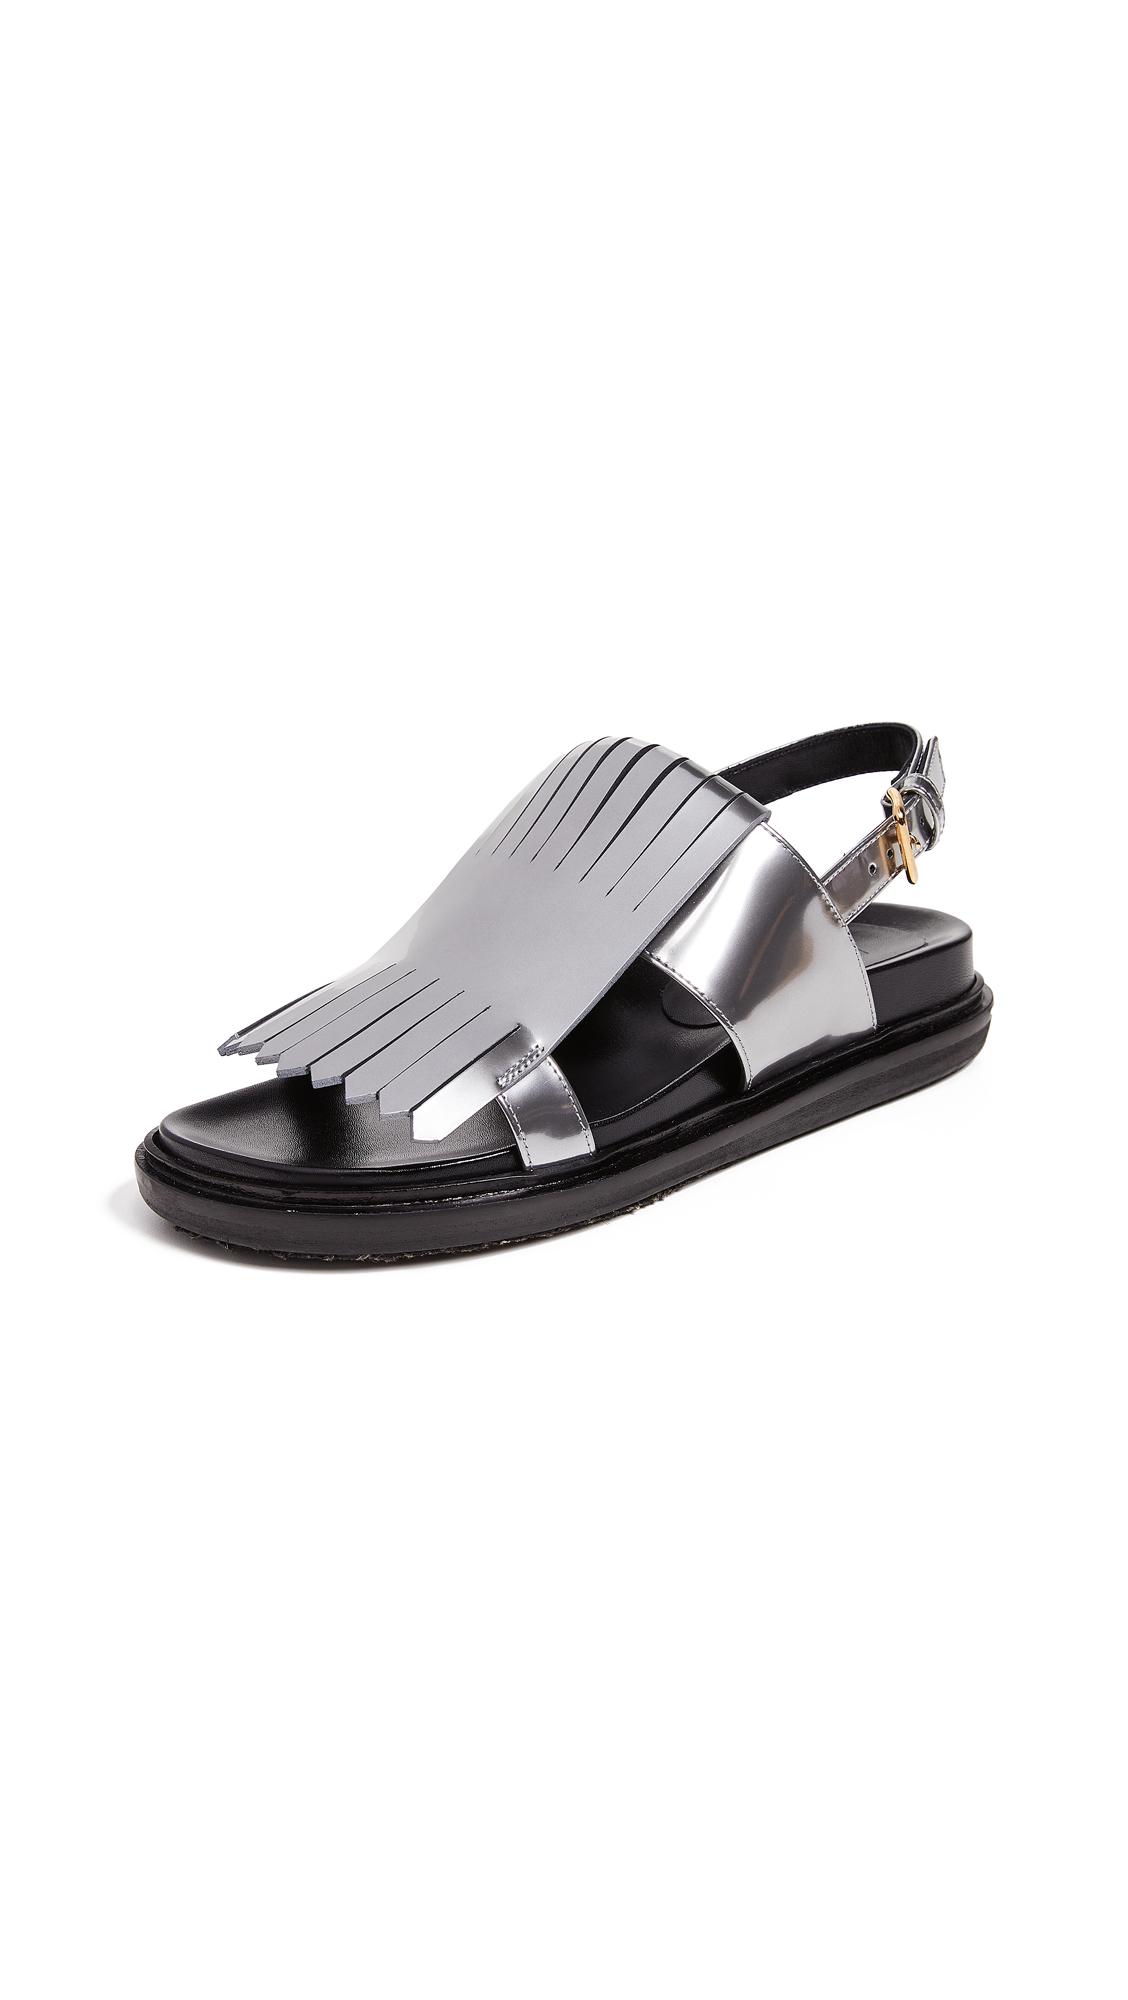 Marni Fussbett Sandals - Silver